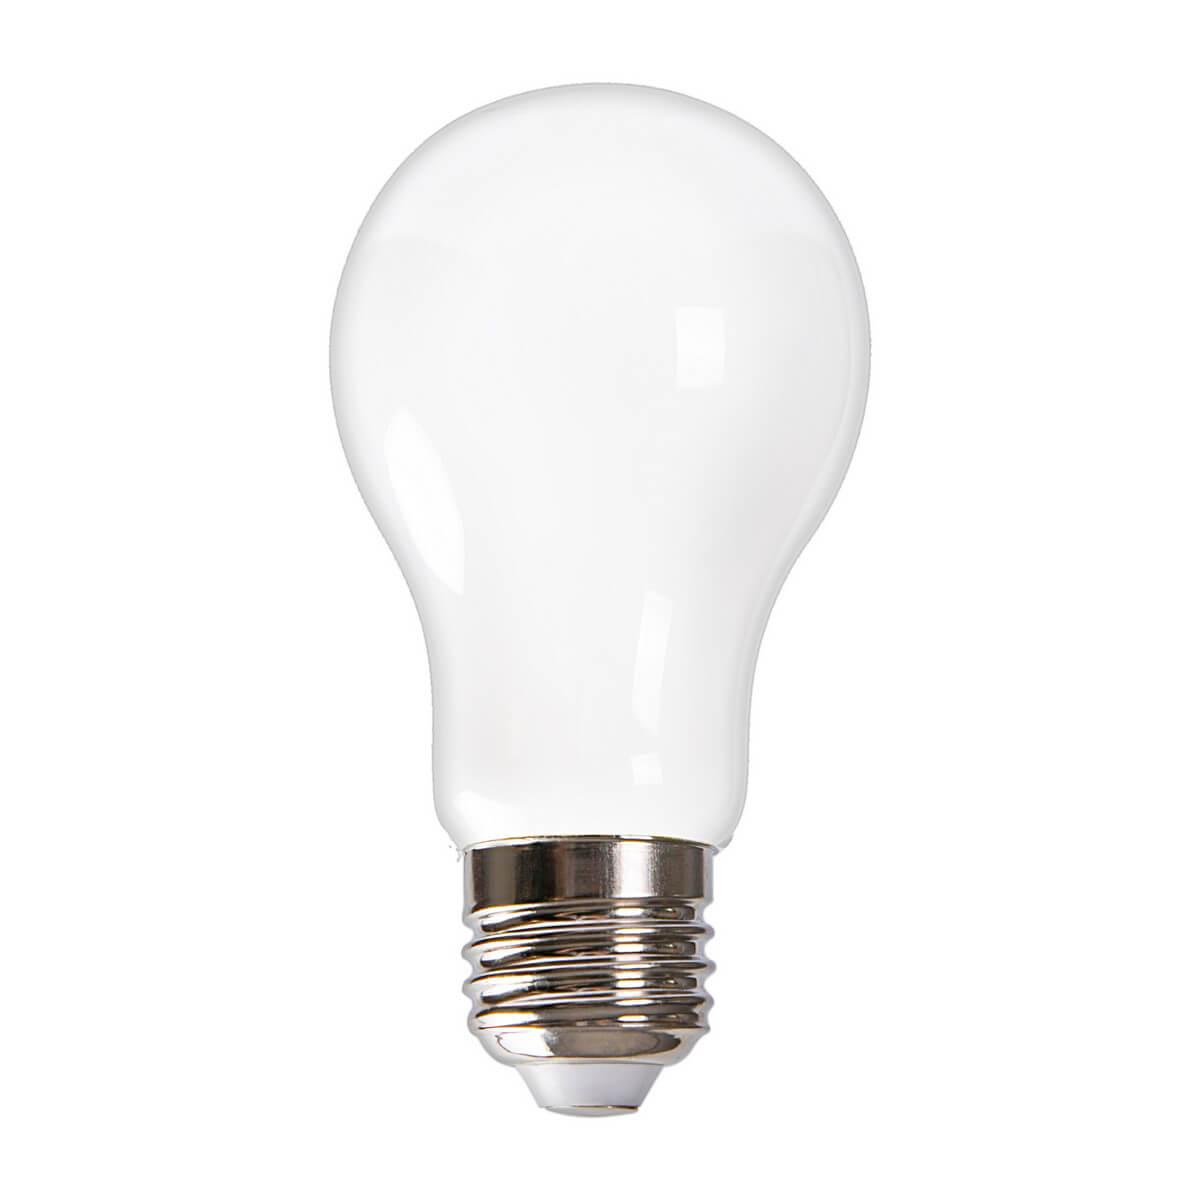 Лампочка Volpe LED-A60-7W/4000K/E27/FR GLH01WH Heaven LED-A60 эра f led a60 e27 7w 220v 2700k